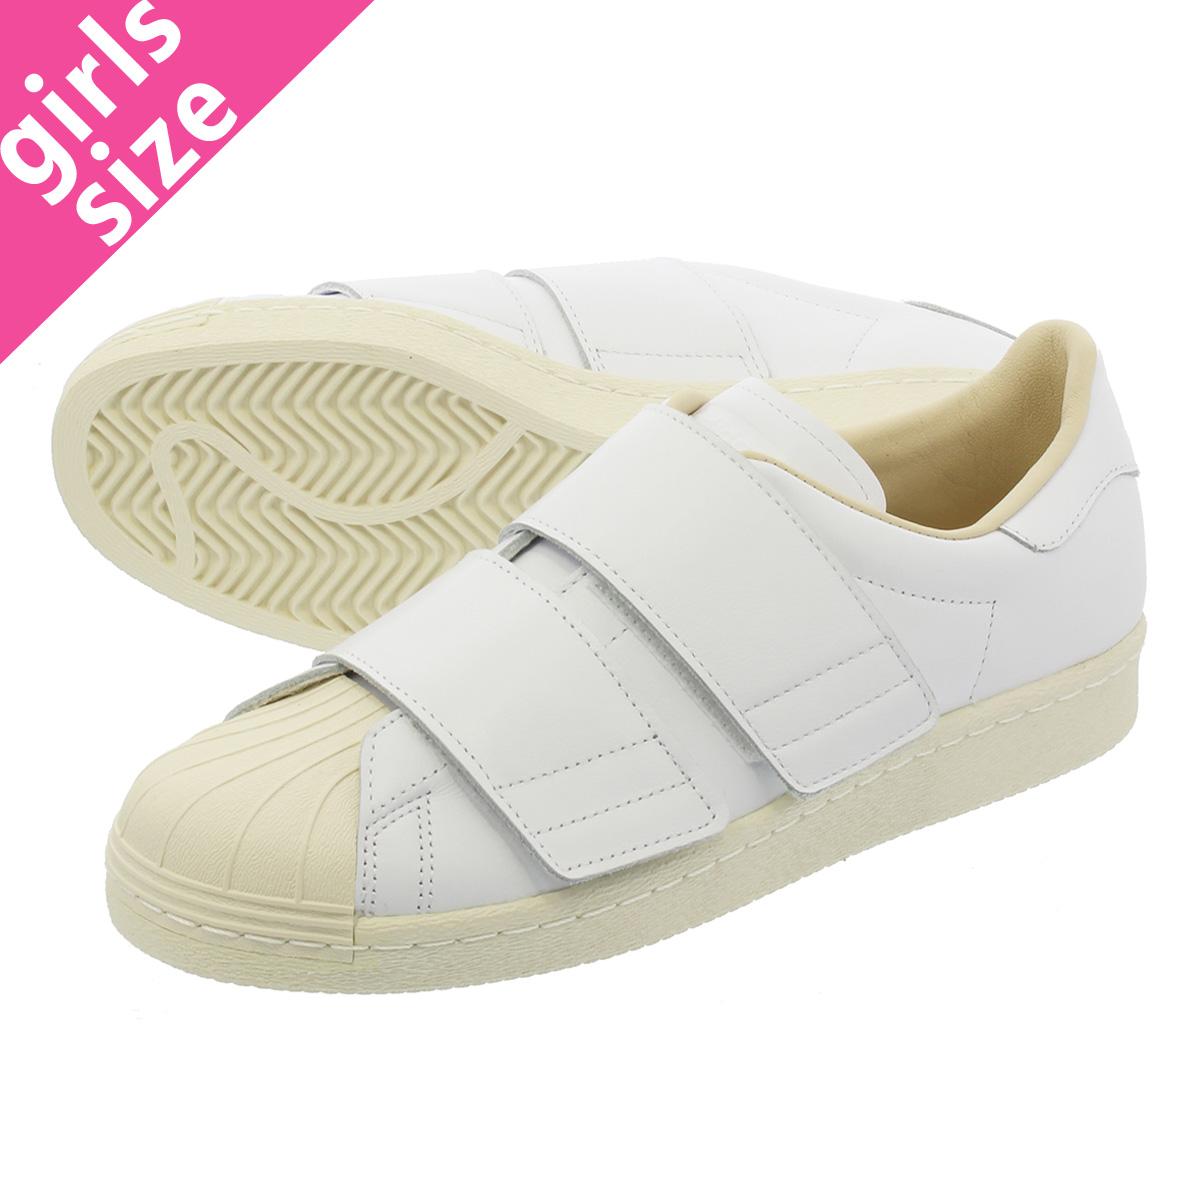 adidas SUPERSTAR 80s VELCRO W Adidas superstar 80s Velcro W RUNNING WHITE/RUNNING WHITE/LINEN